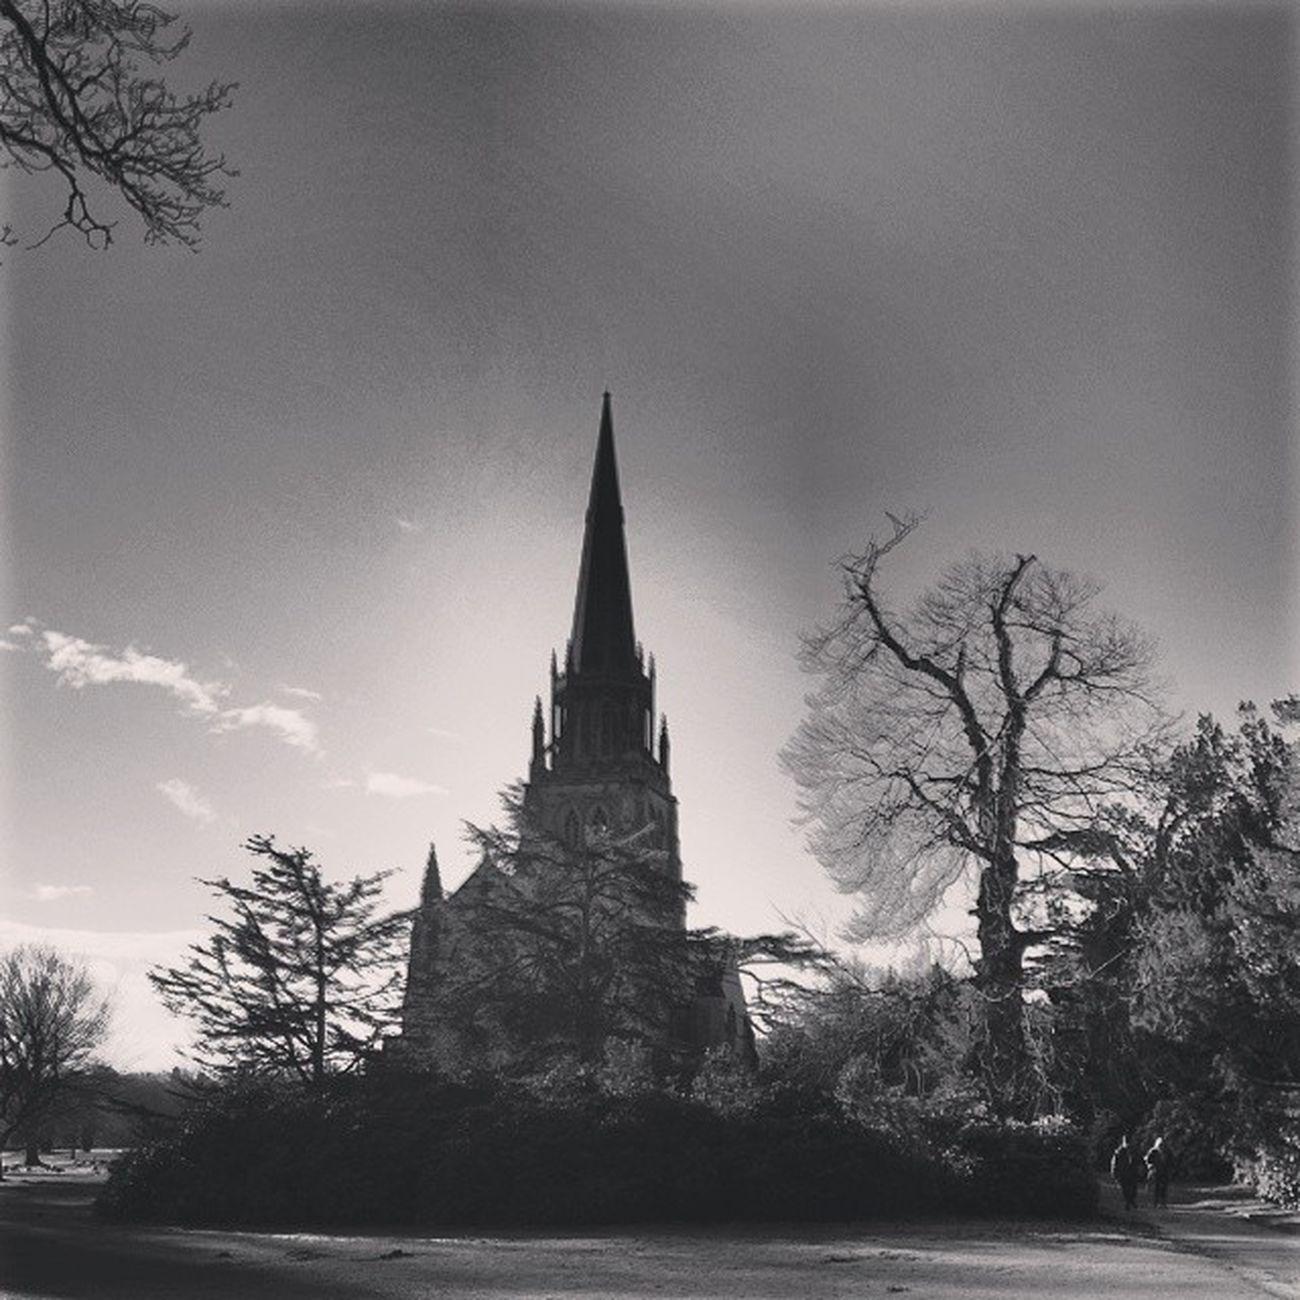 Clumber park church